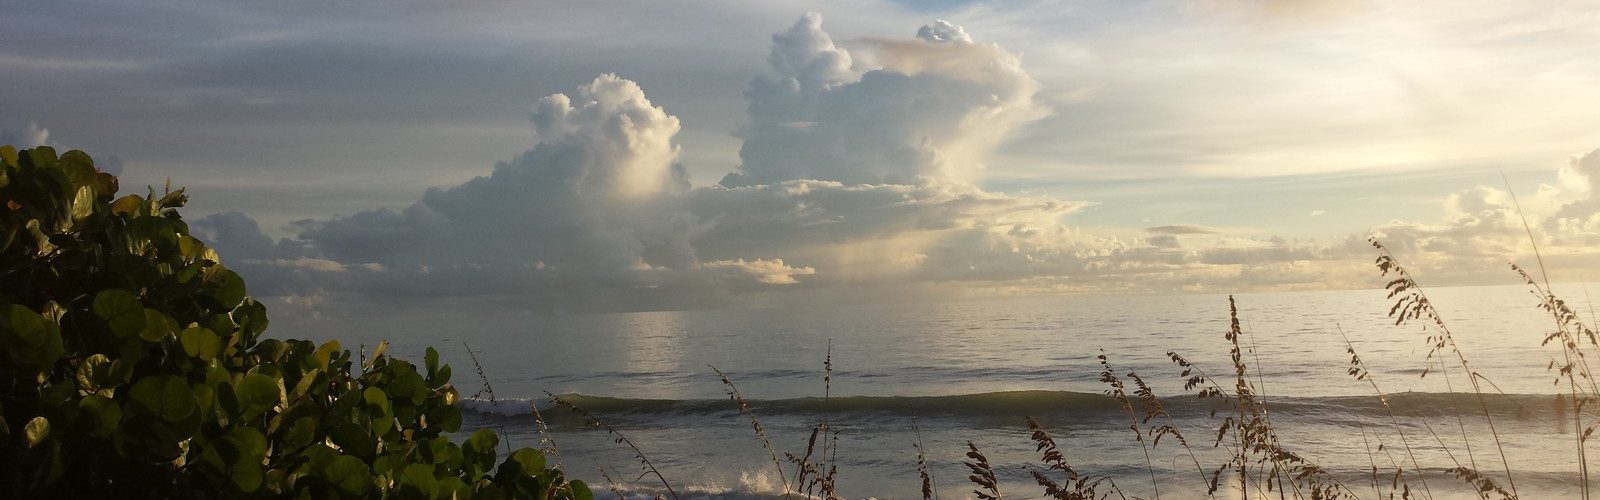 Morning Sea Oats and Sea Grapes